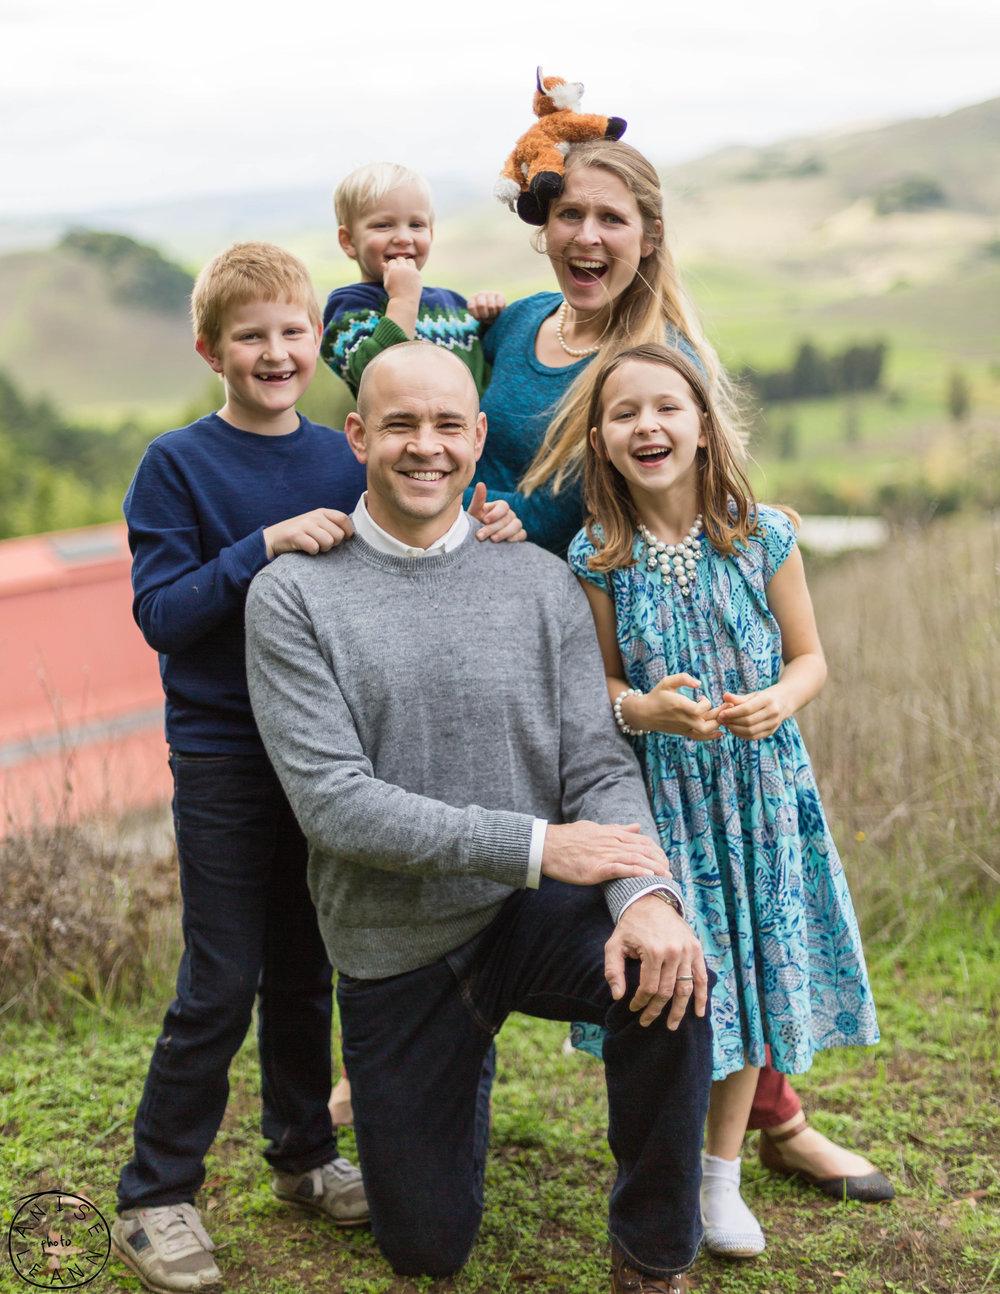 Family Photos Nicasio California